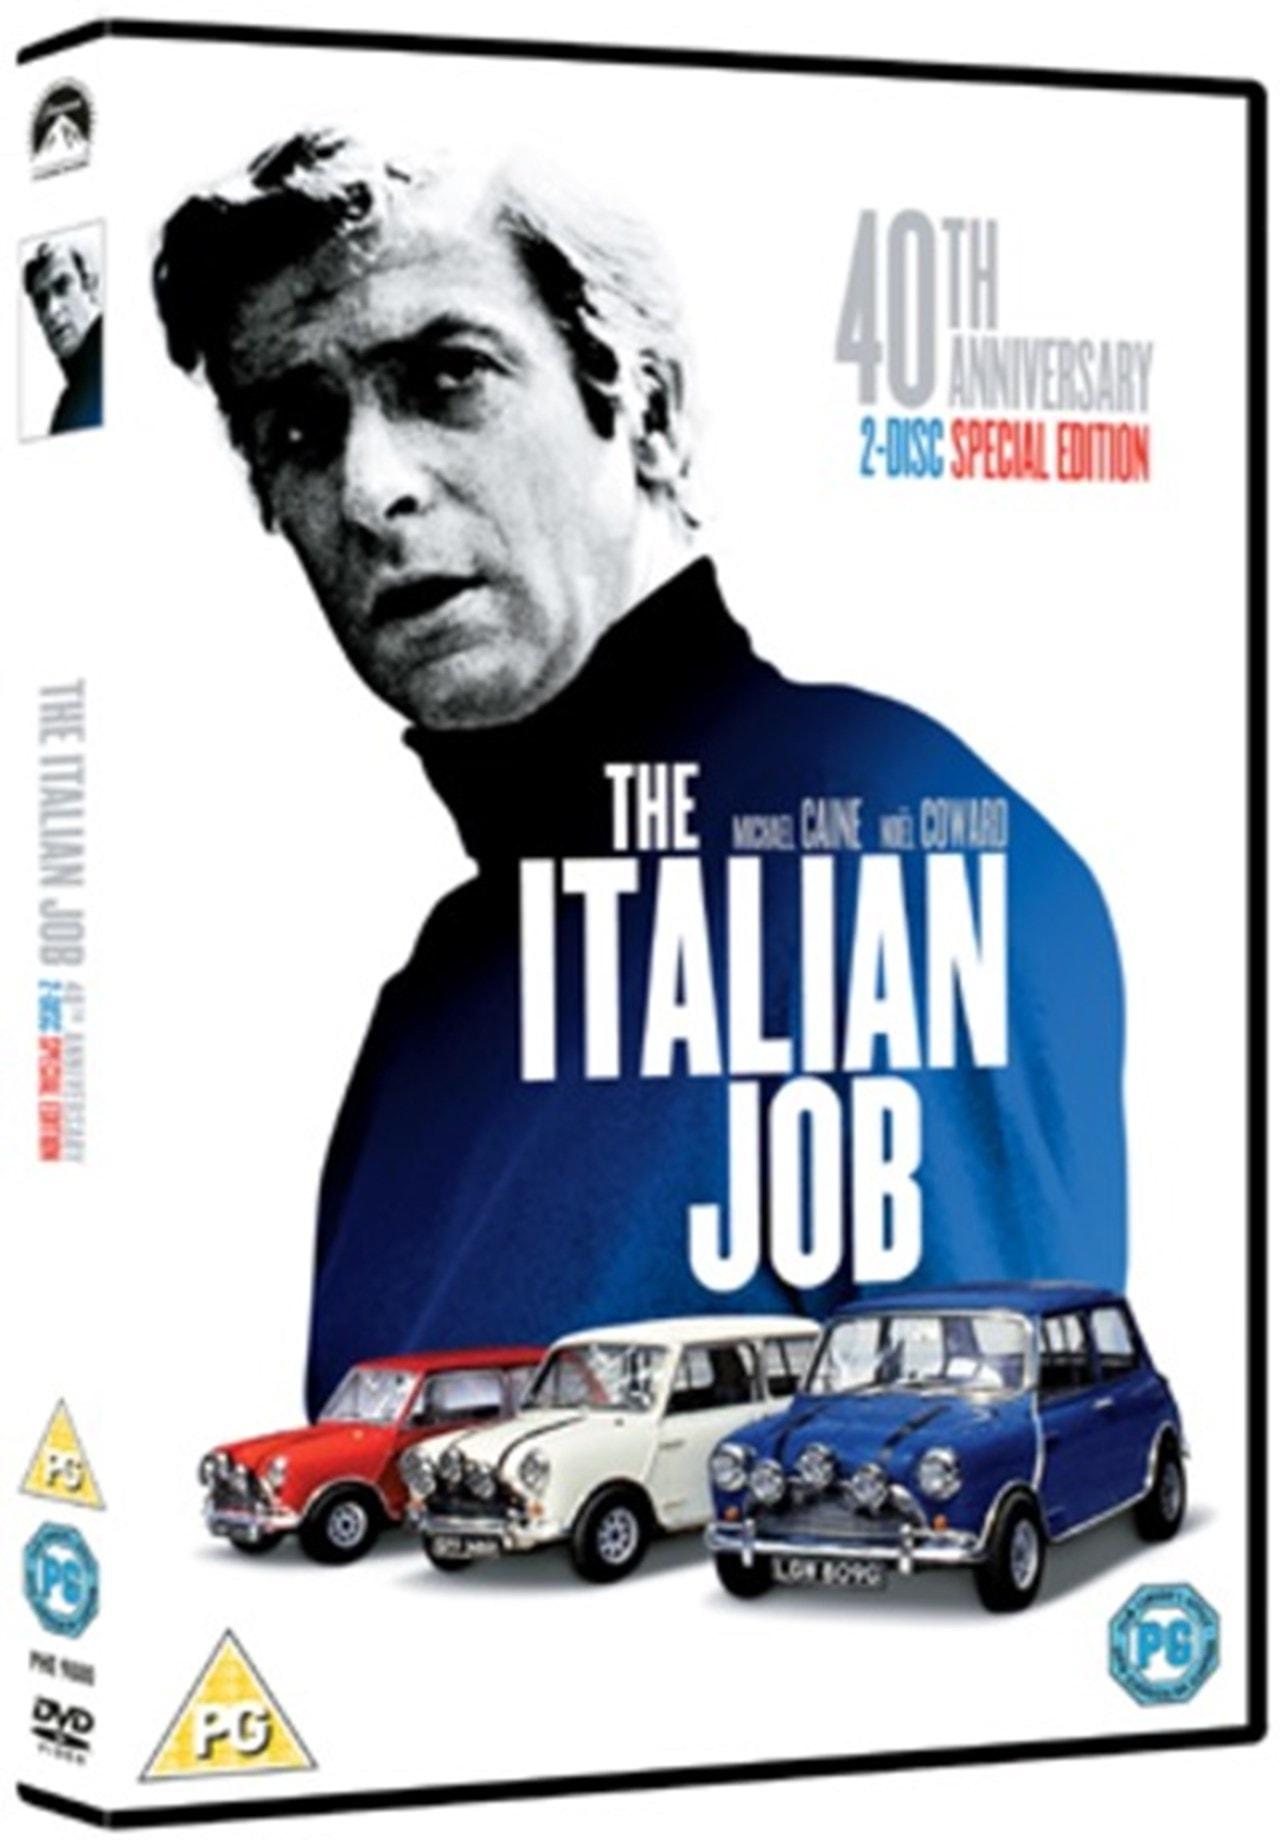 The Italian Job - 1